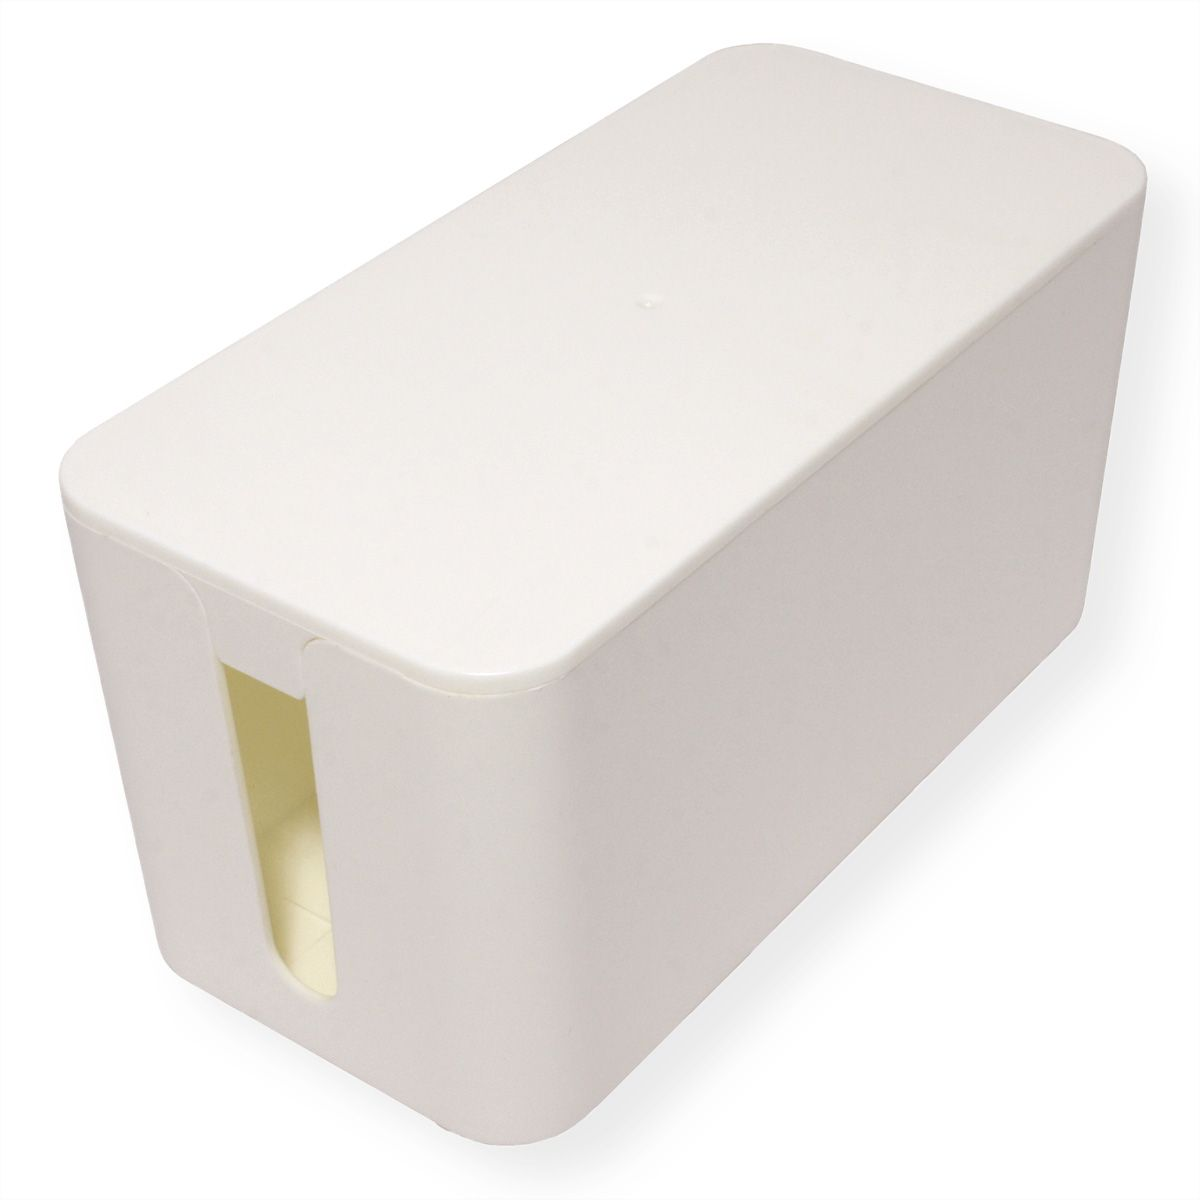 Value Cable Box Small